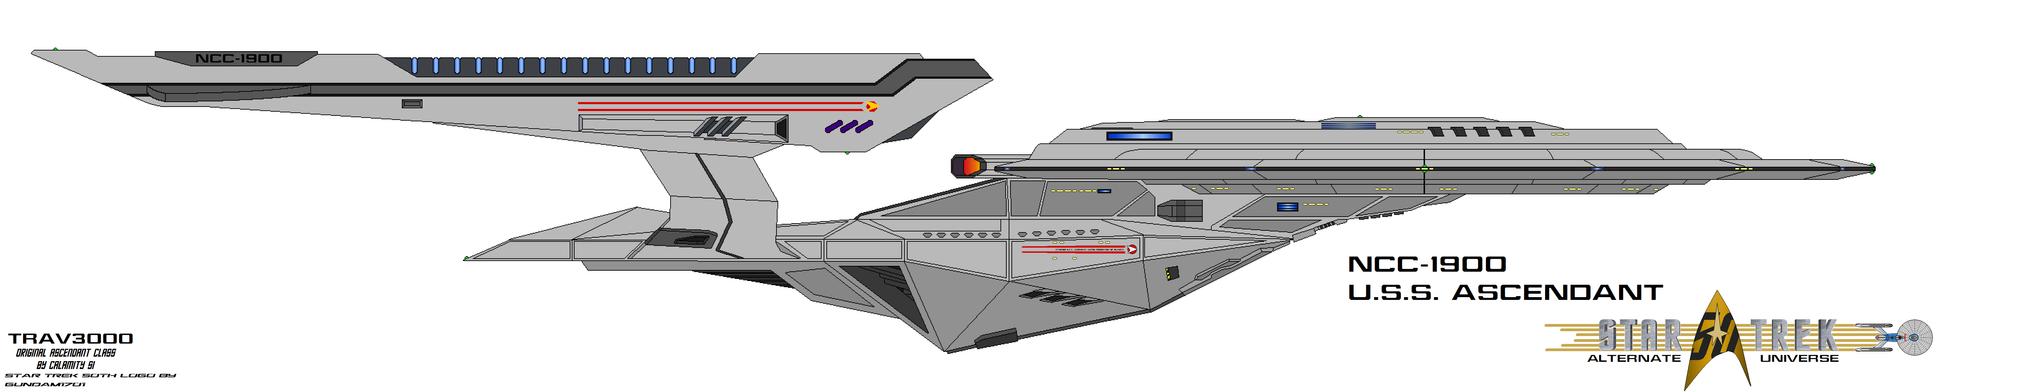 NCC-1900 USS Ascendant by trav3000